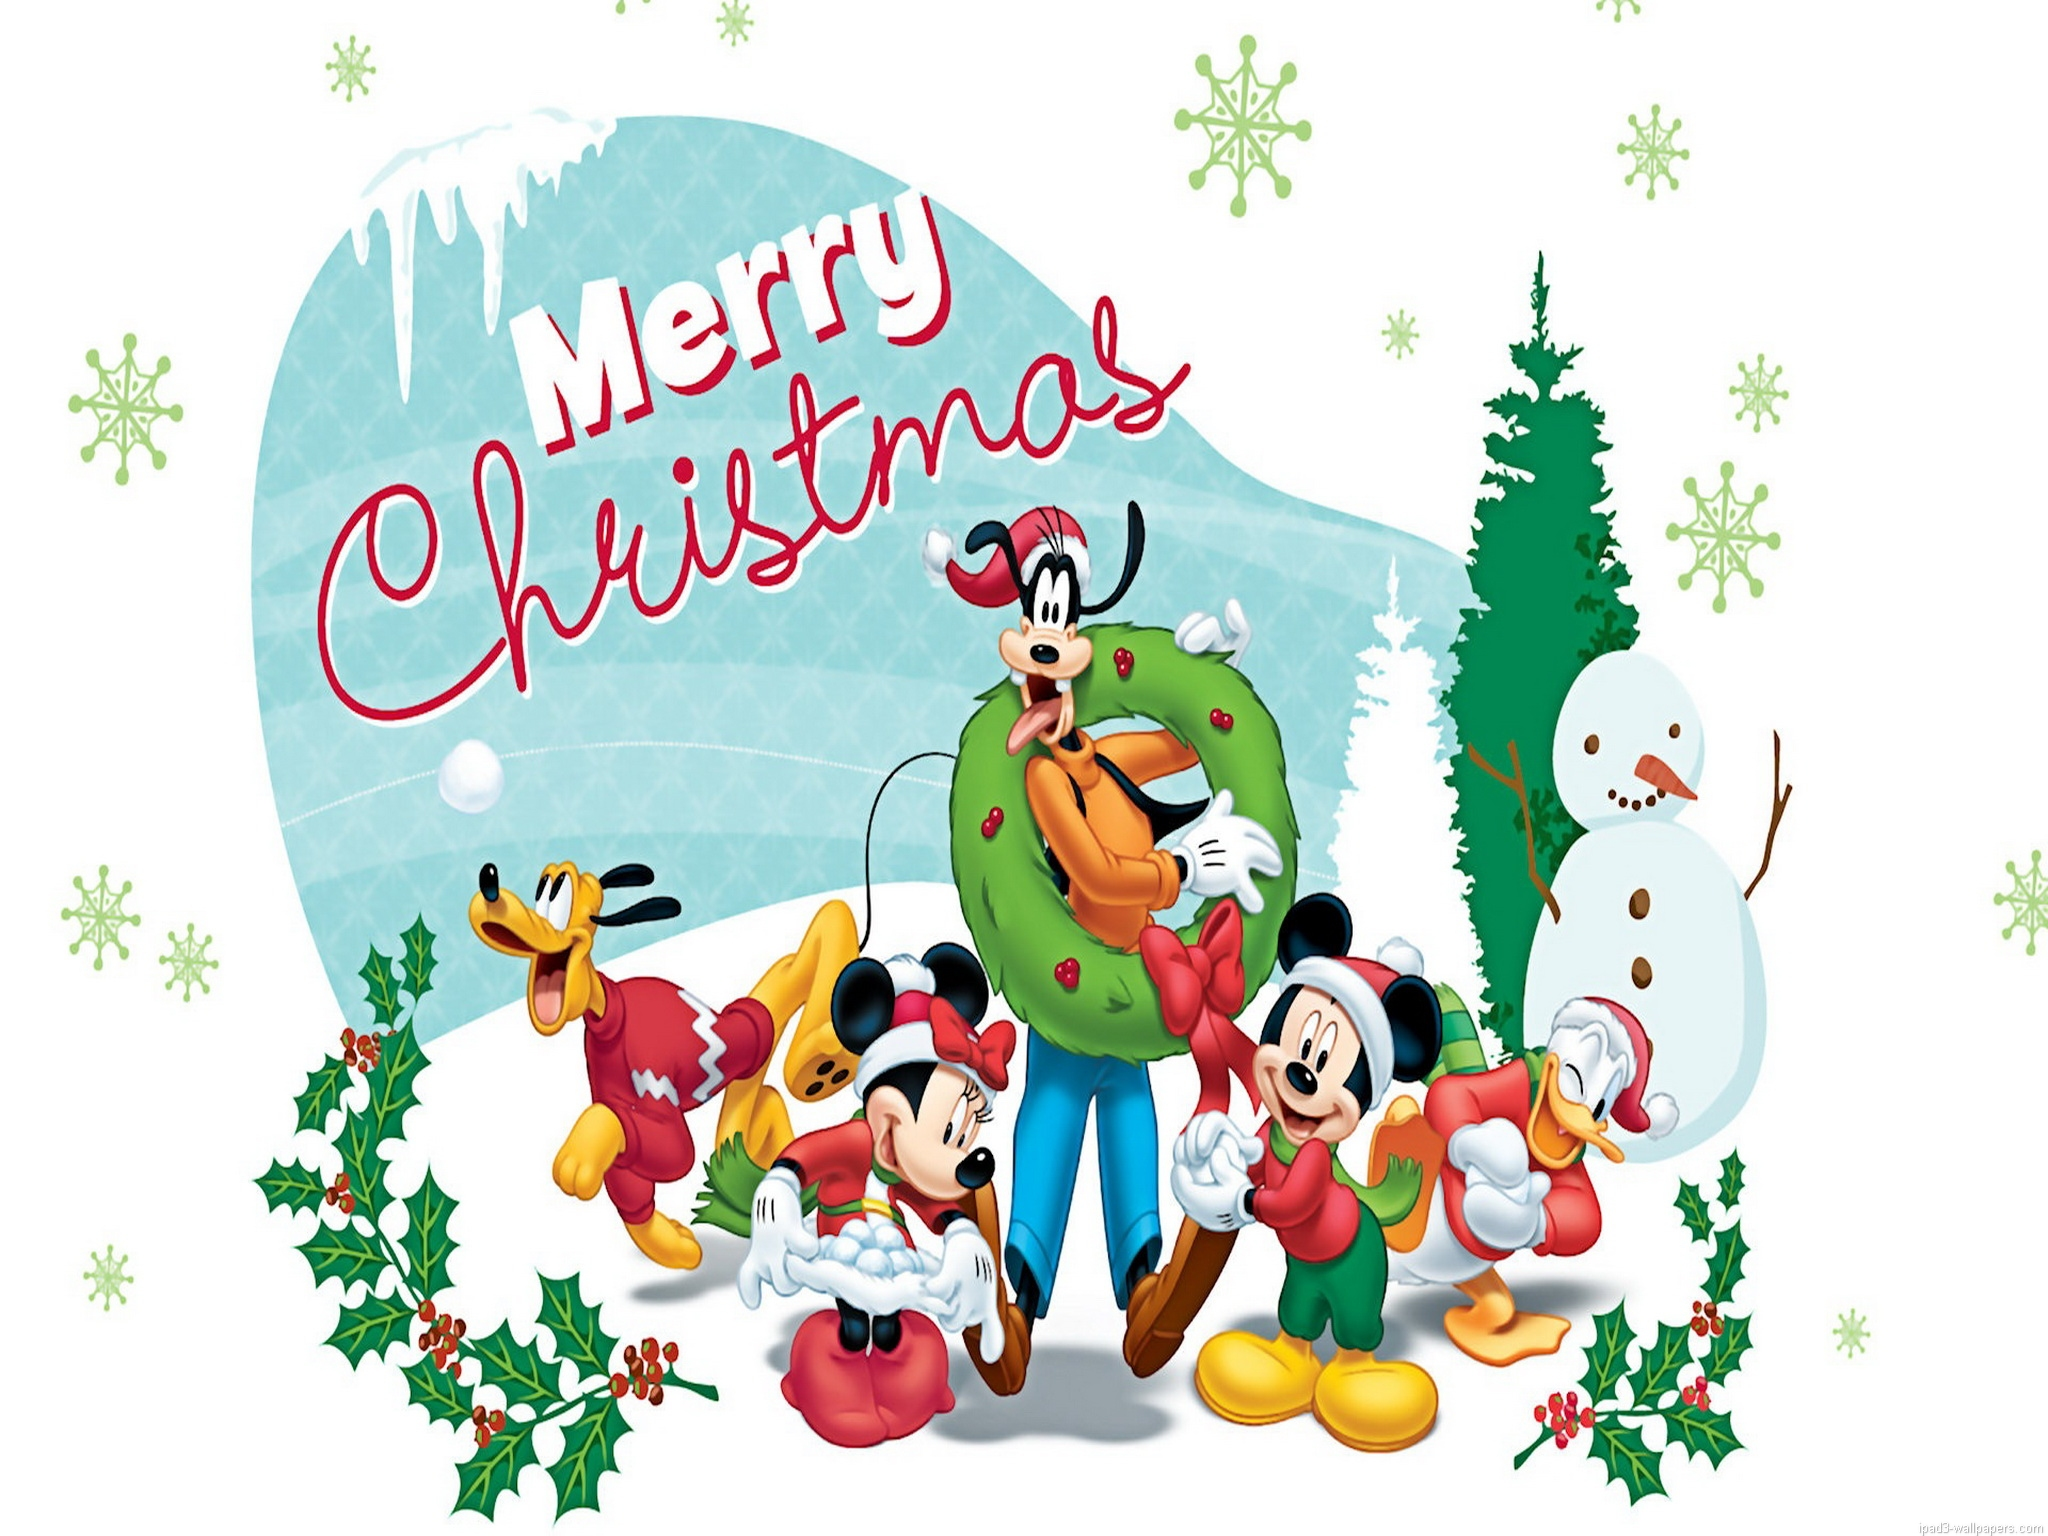 47 Disney Christmas Wallpaper For Ipad On Wallpapersafari